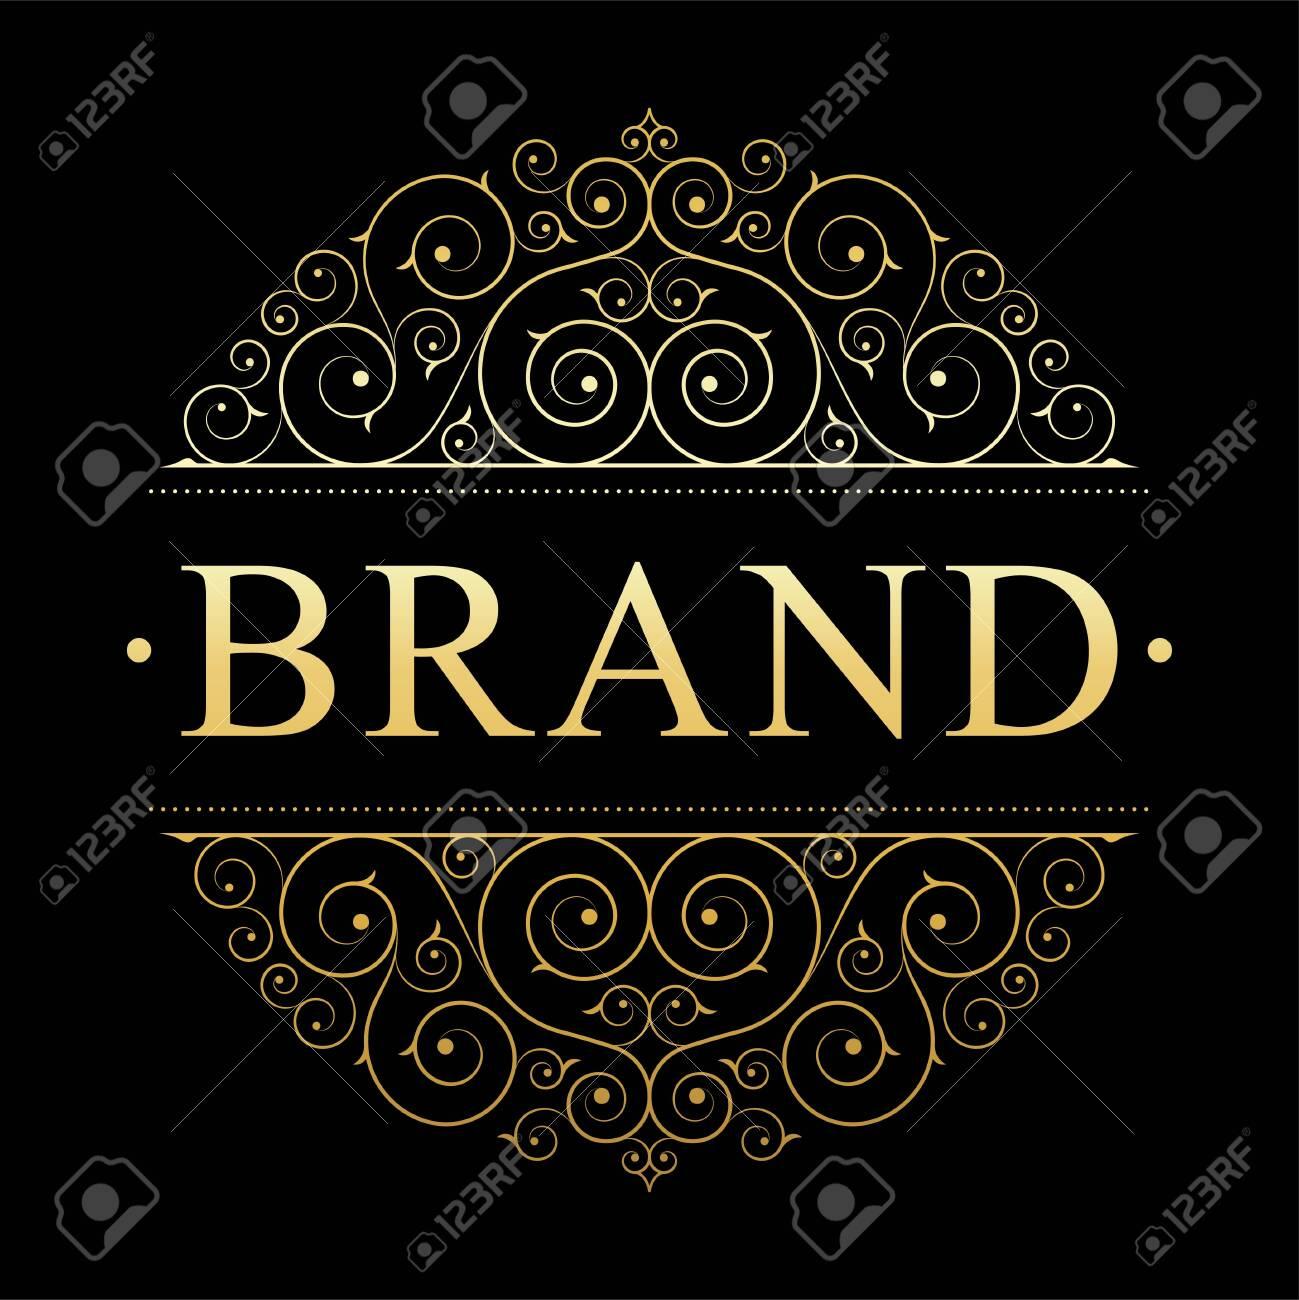 Retro vintage luxury logo template with floral elegant calligraphic elements. - 149583808